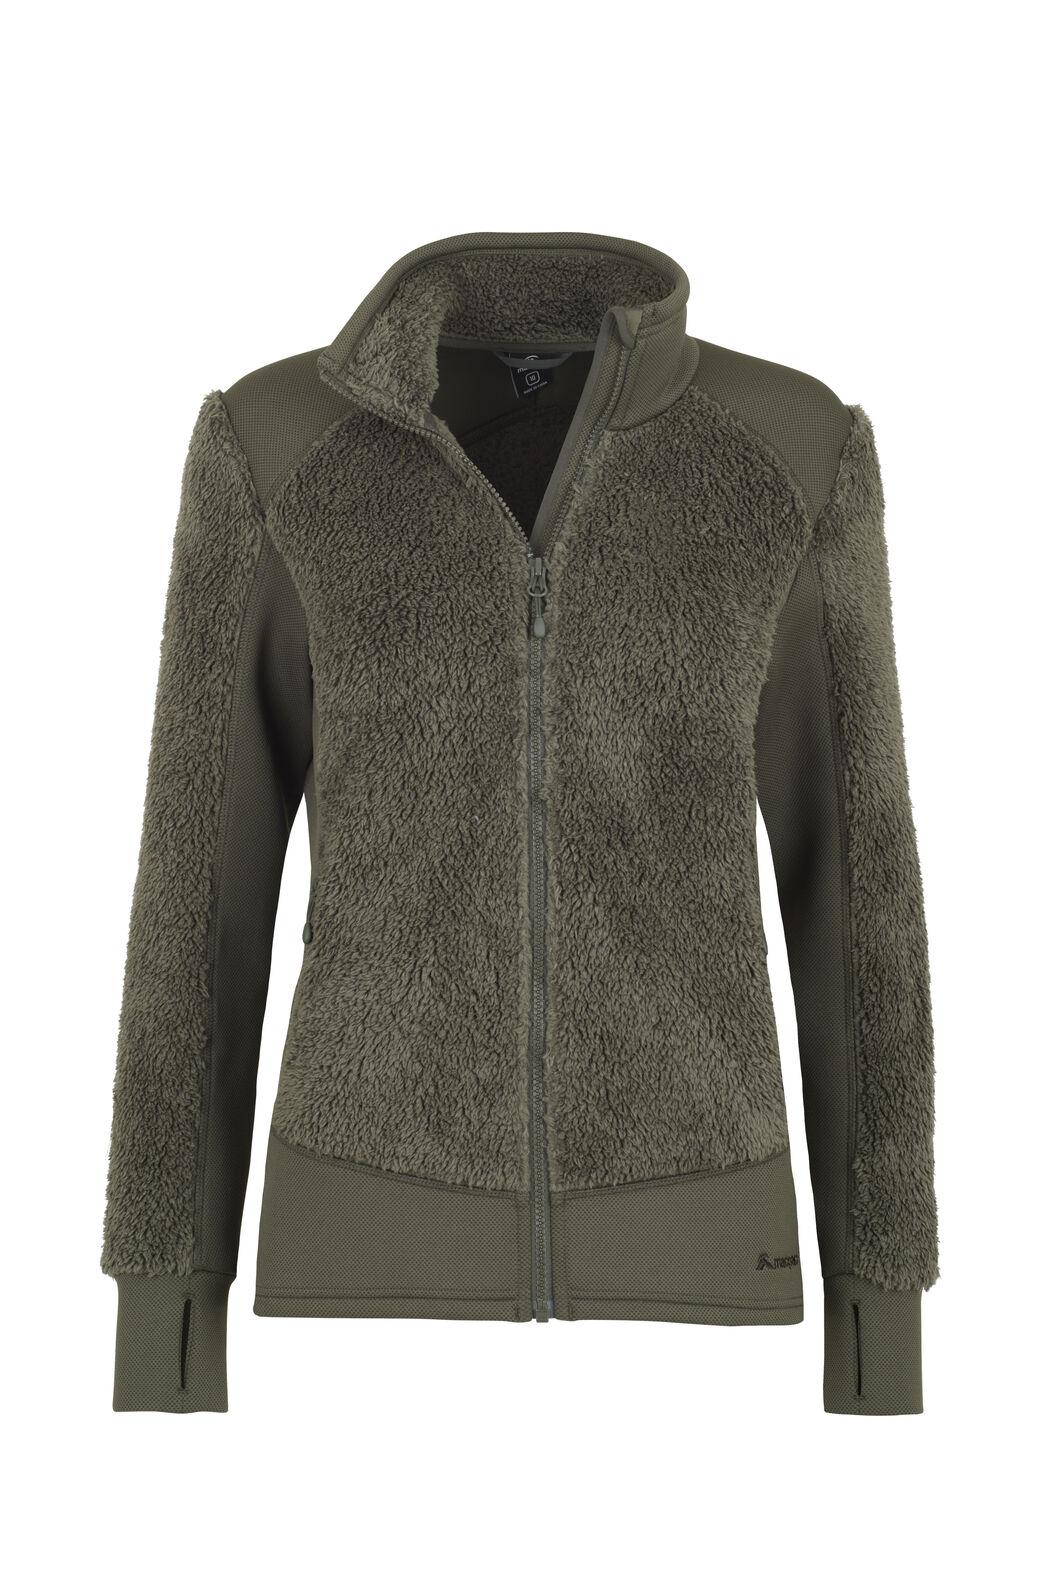 Macpac Haast Sherpa Fleece - Women's, Peat, hi-res